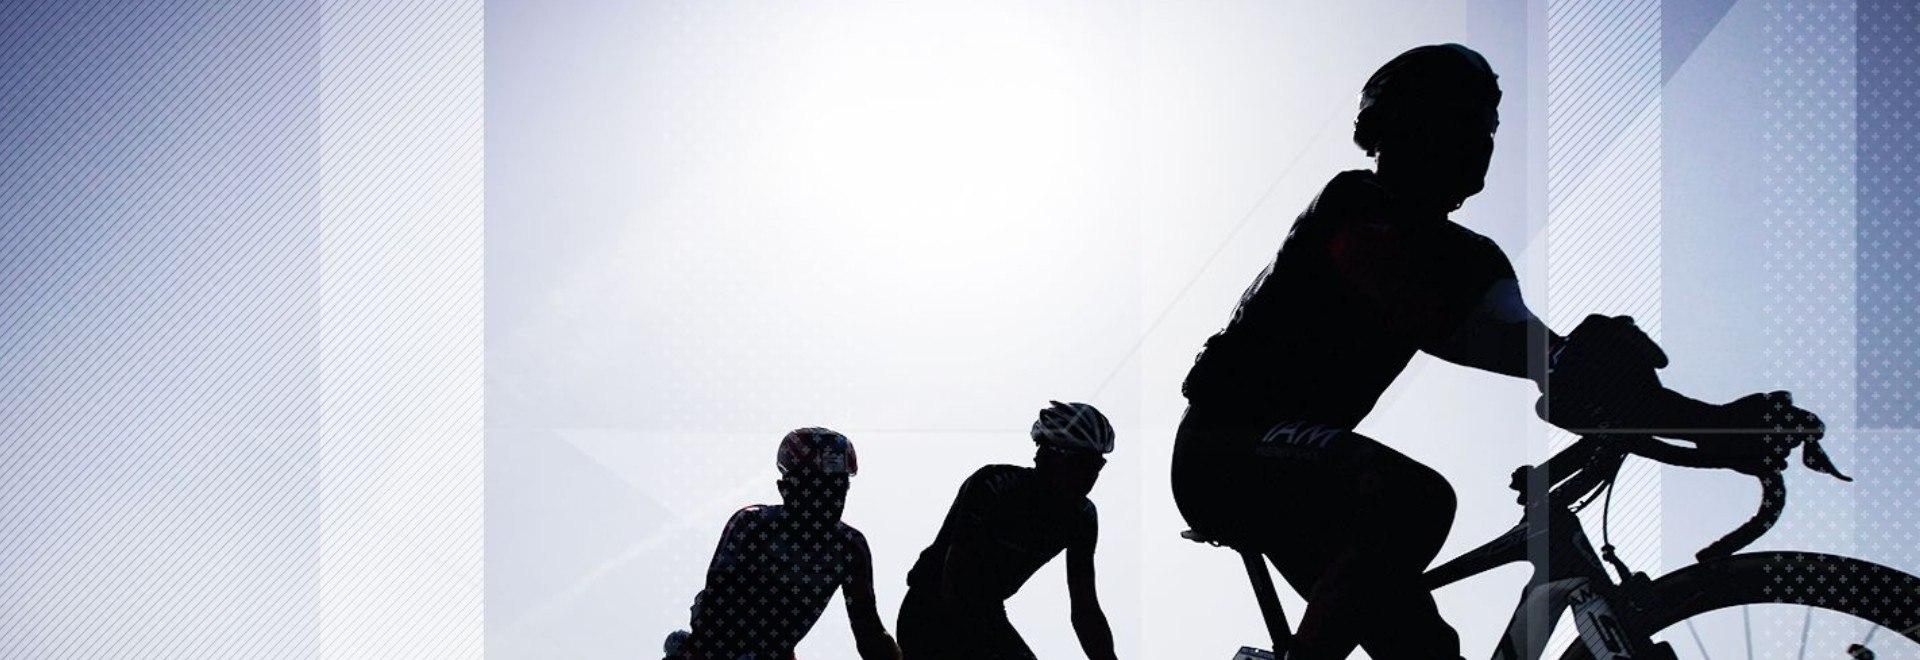 Giro d'Italia - Giro delle Fiandre